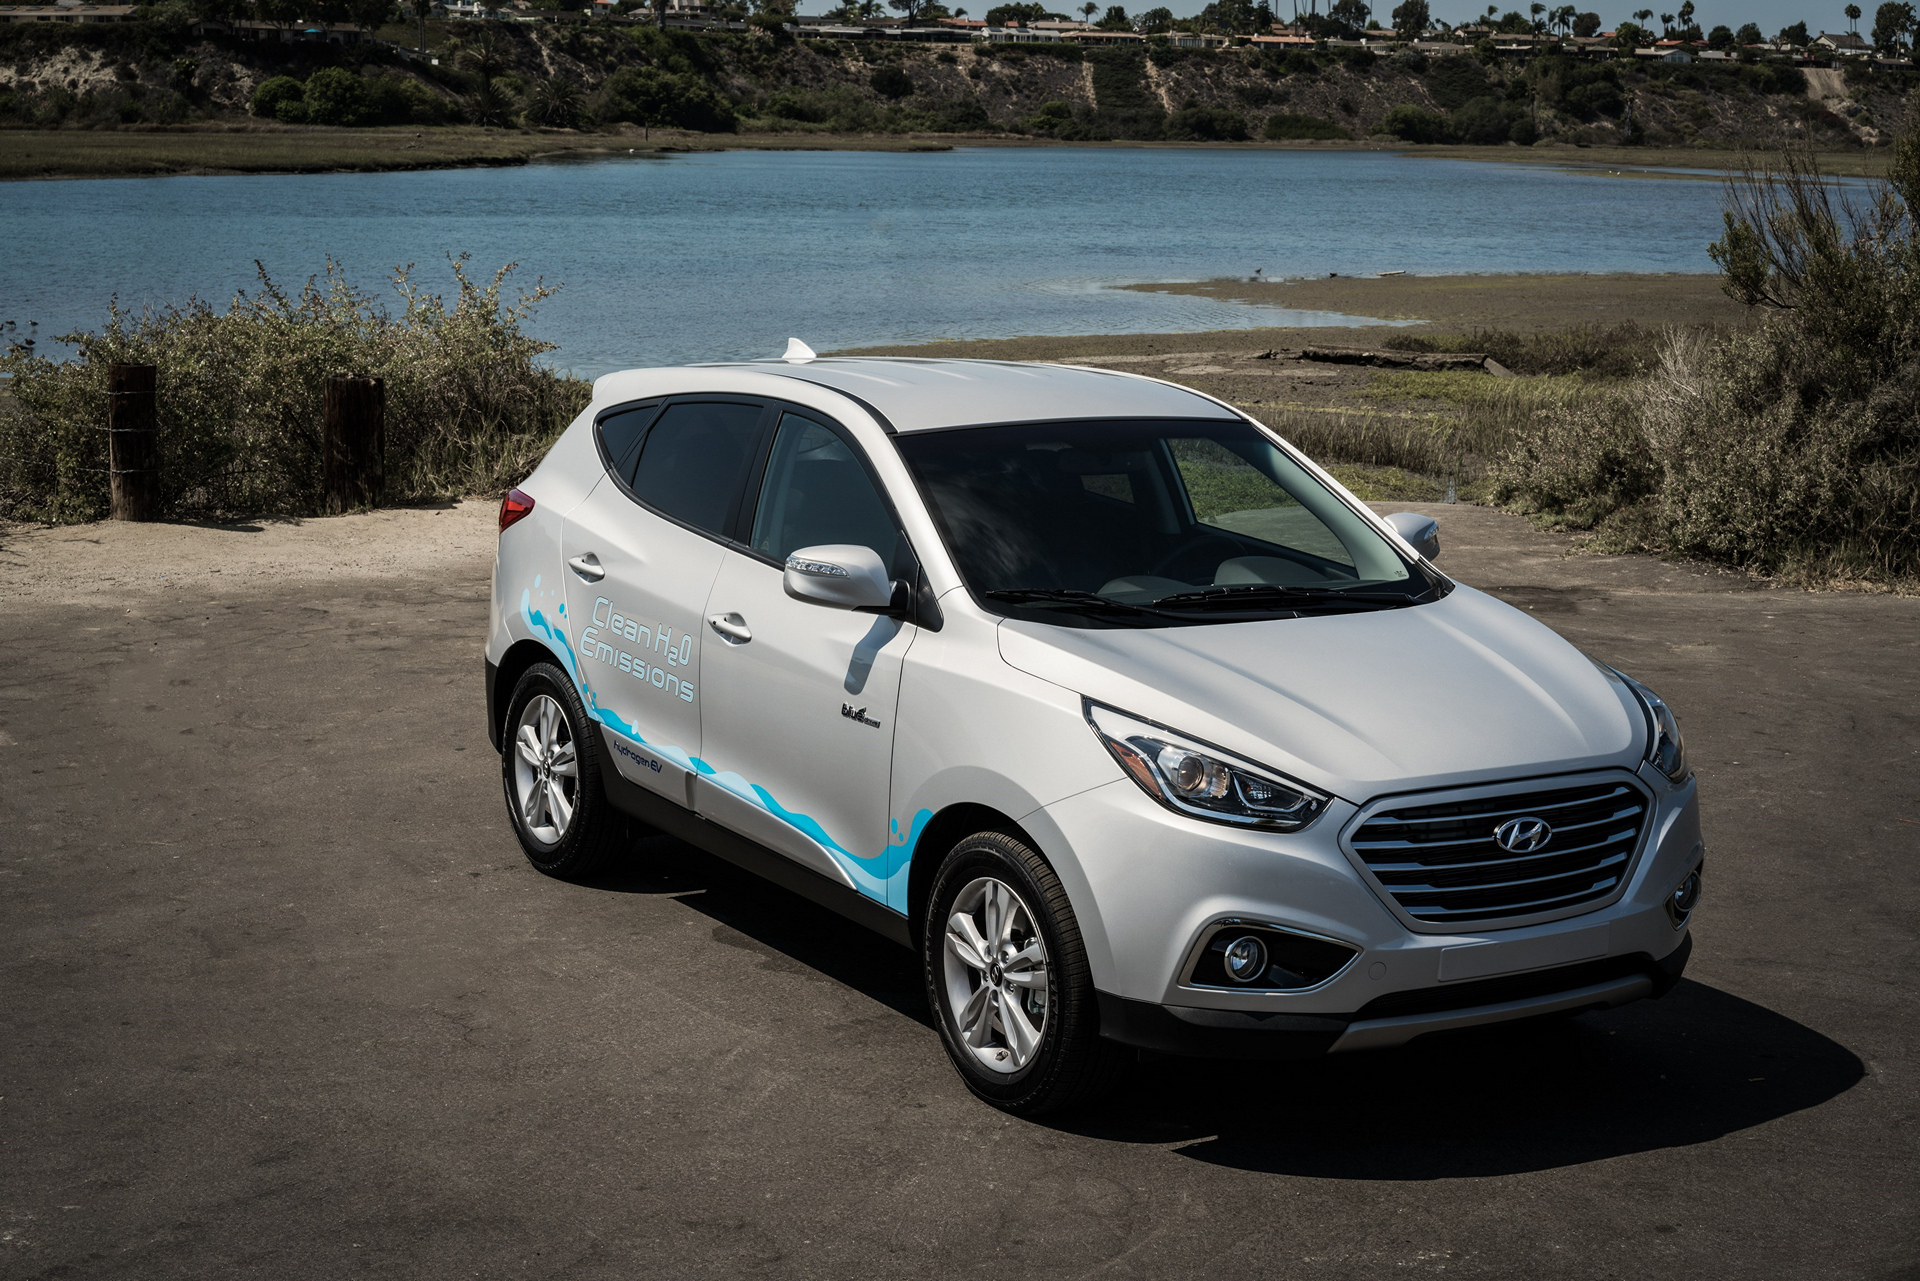 2017 Hyundai Tucson Fuel Cell © Hyundai Motor Company